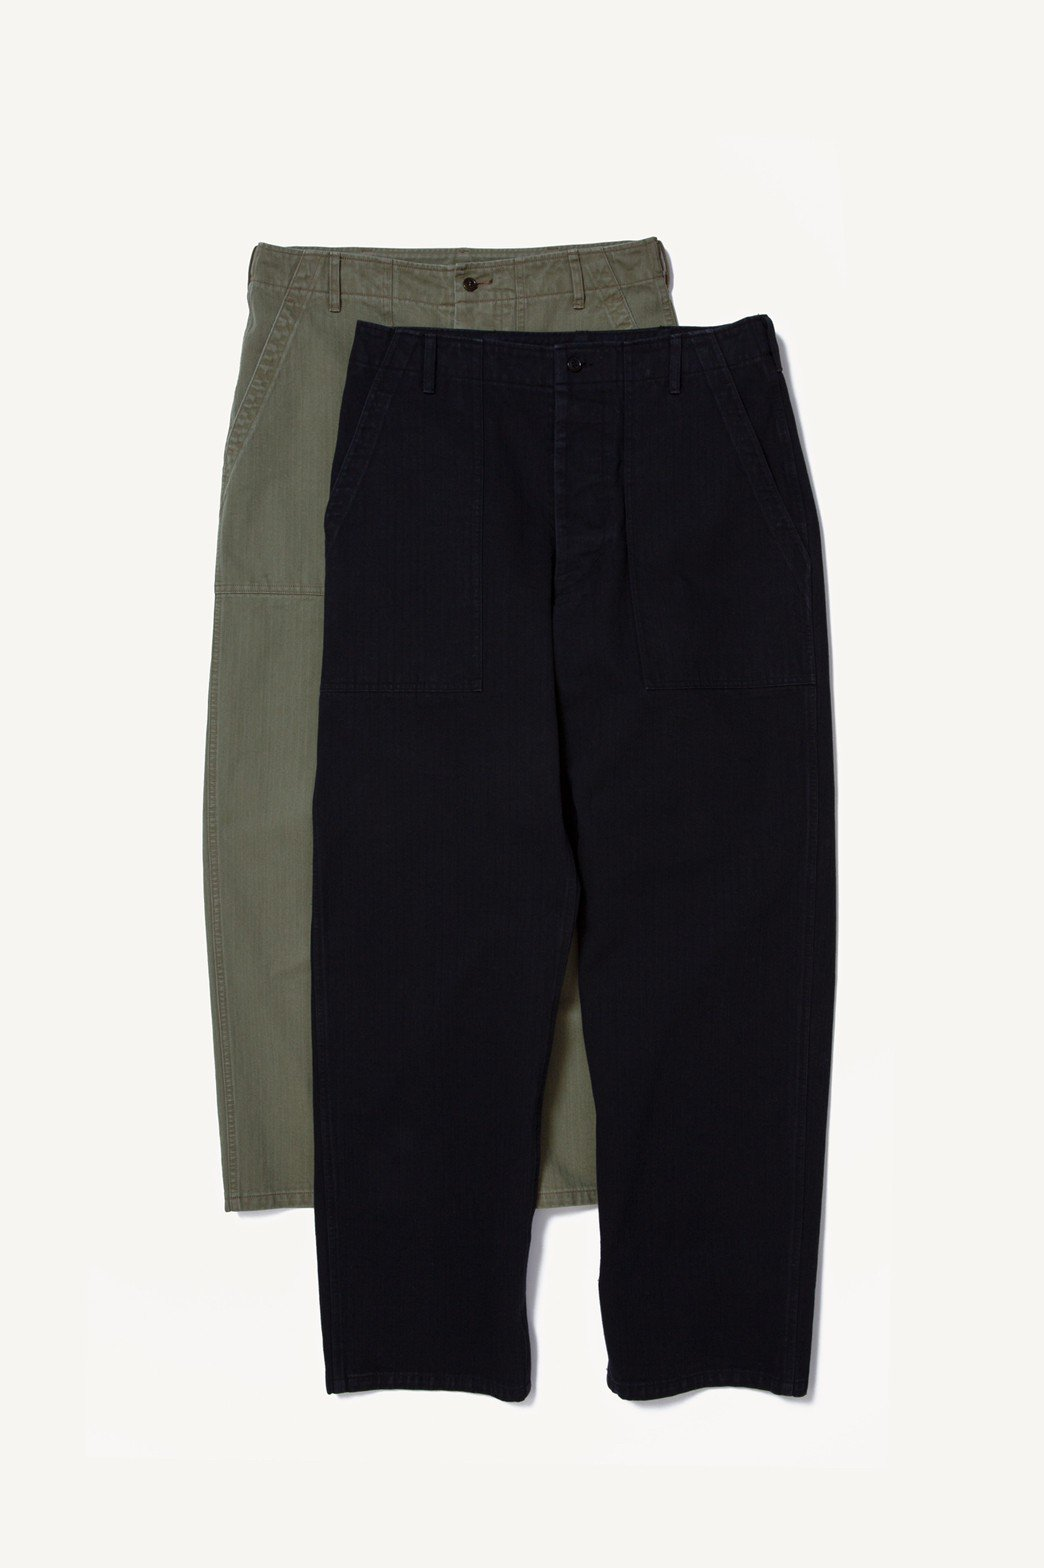 A.PRESSE / M-43 HBT Pants